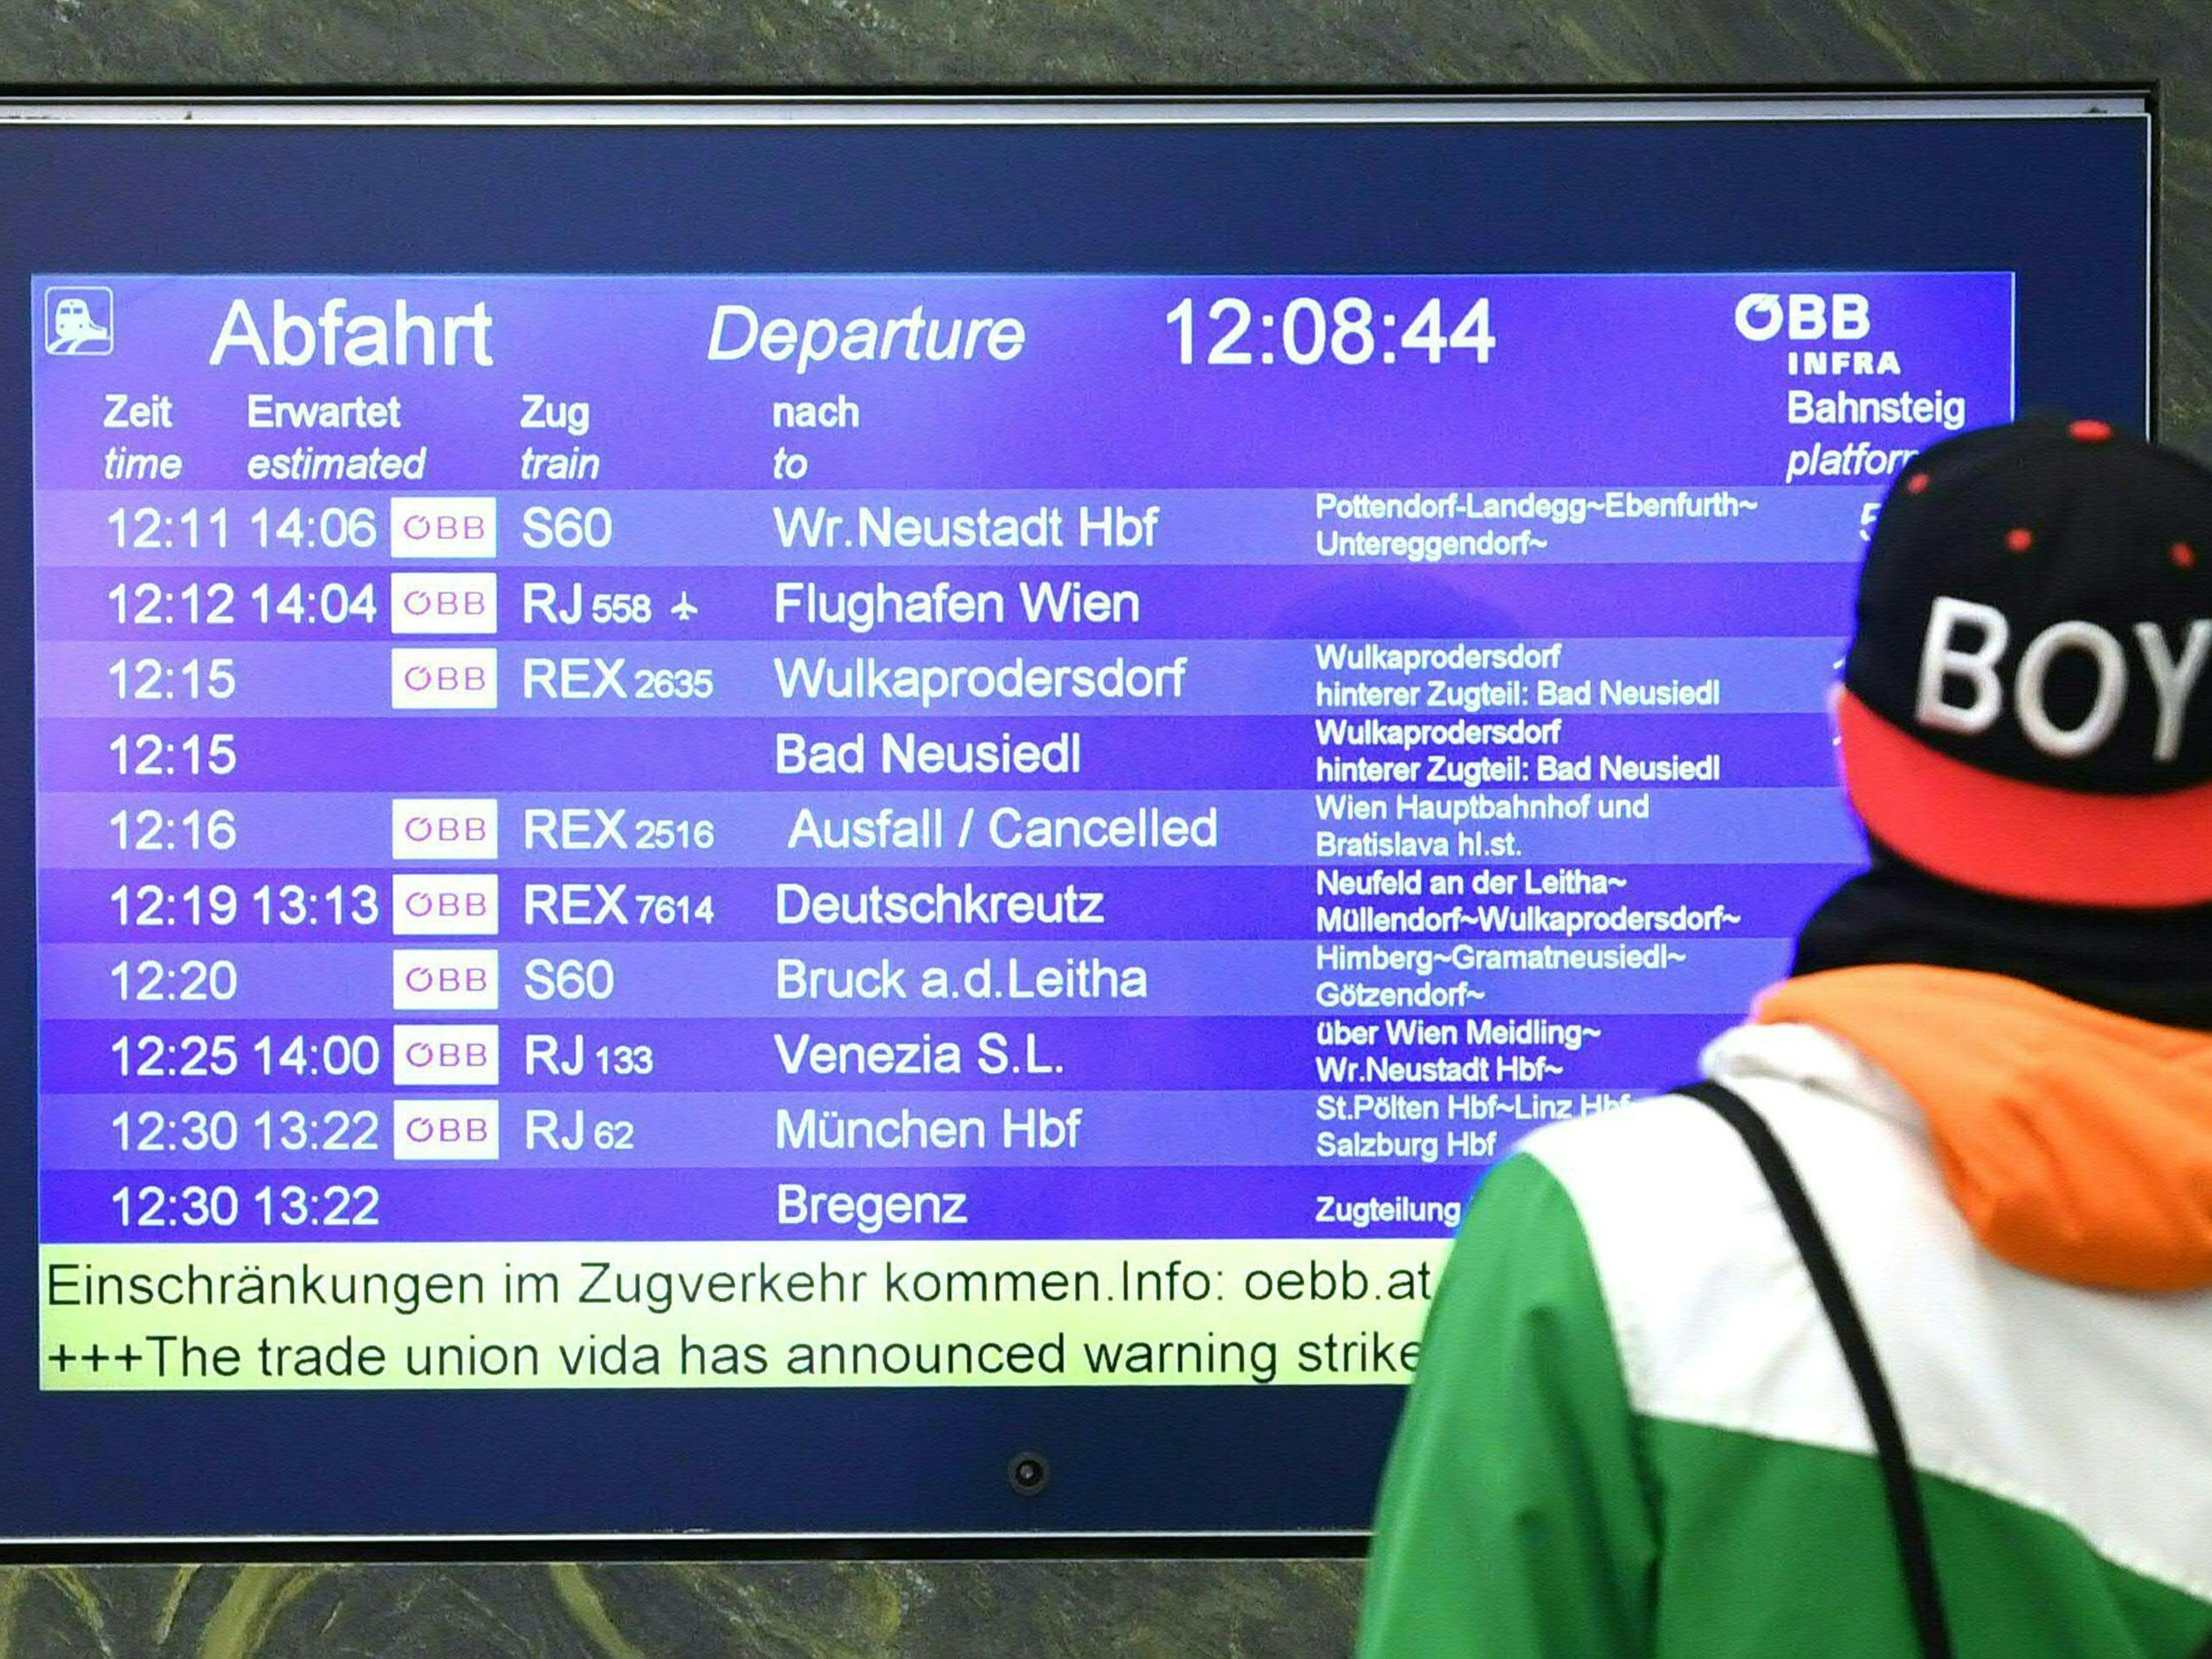 Westbahnstrecke 2800 Züge Fallen Wegen Baustellen Aus